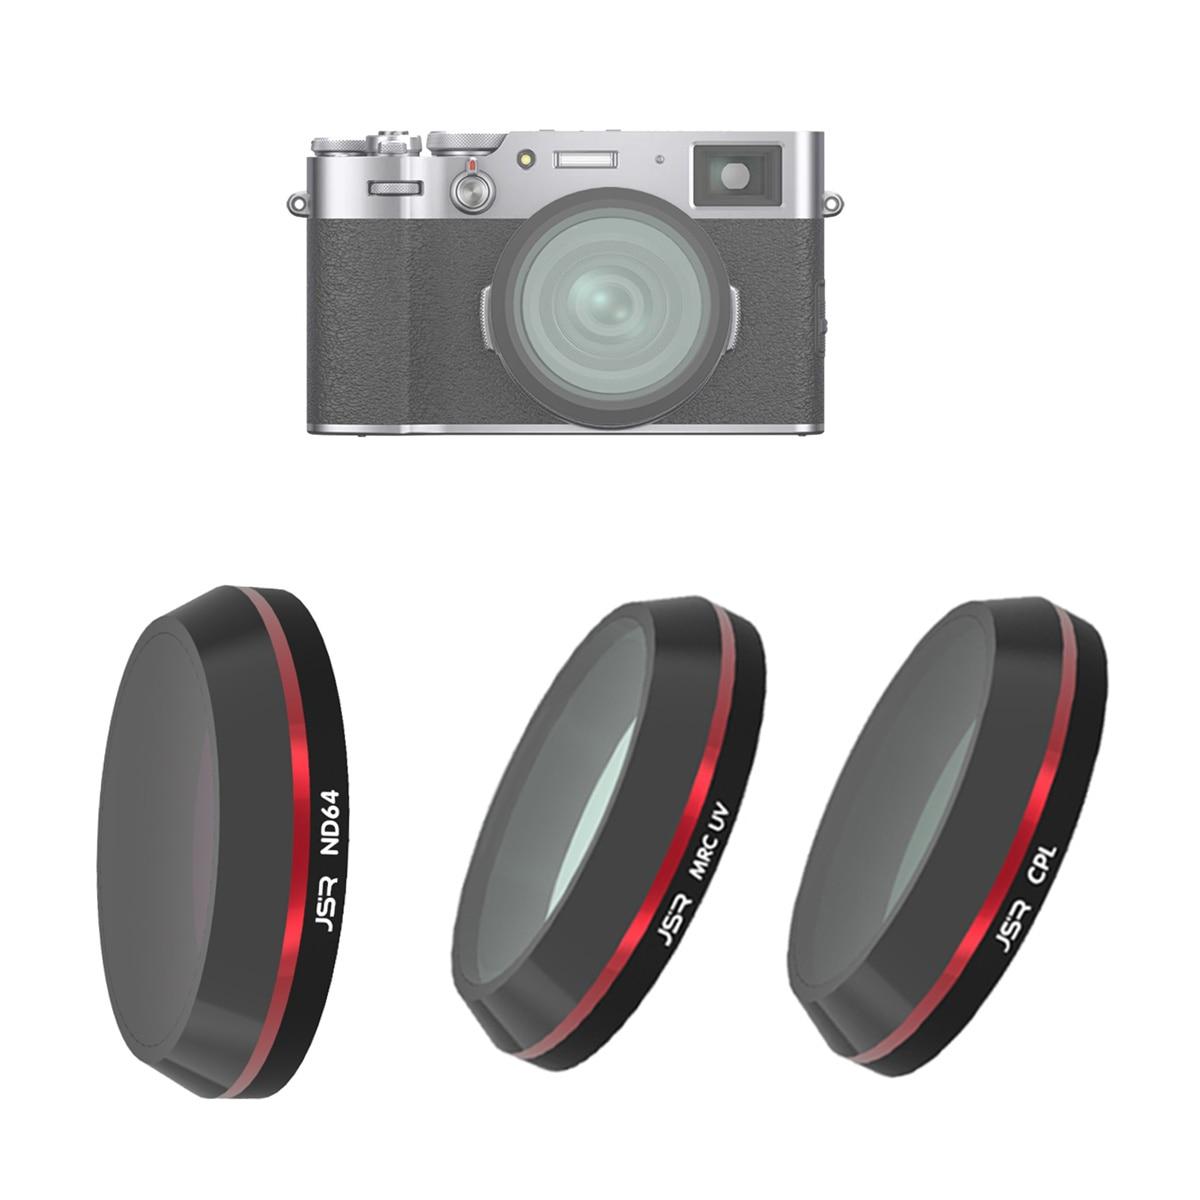 Filtro Protector de lente polarizador de densidad neutra CPL PL ND64 para cámara Fujifilm Fuji X100 X100T X100F X100V X100S